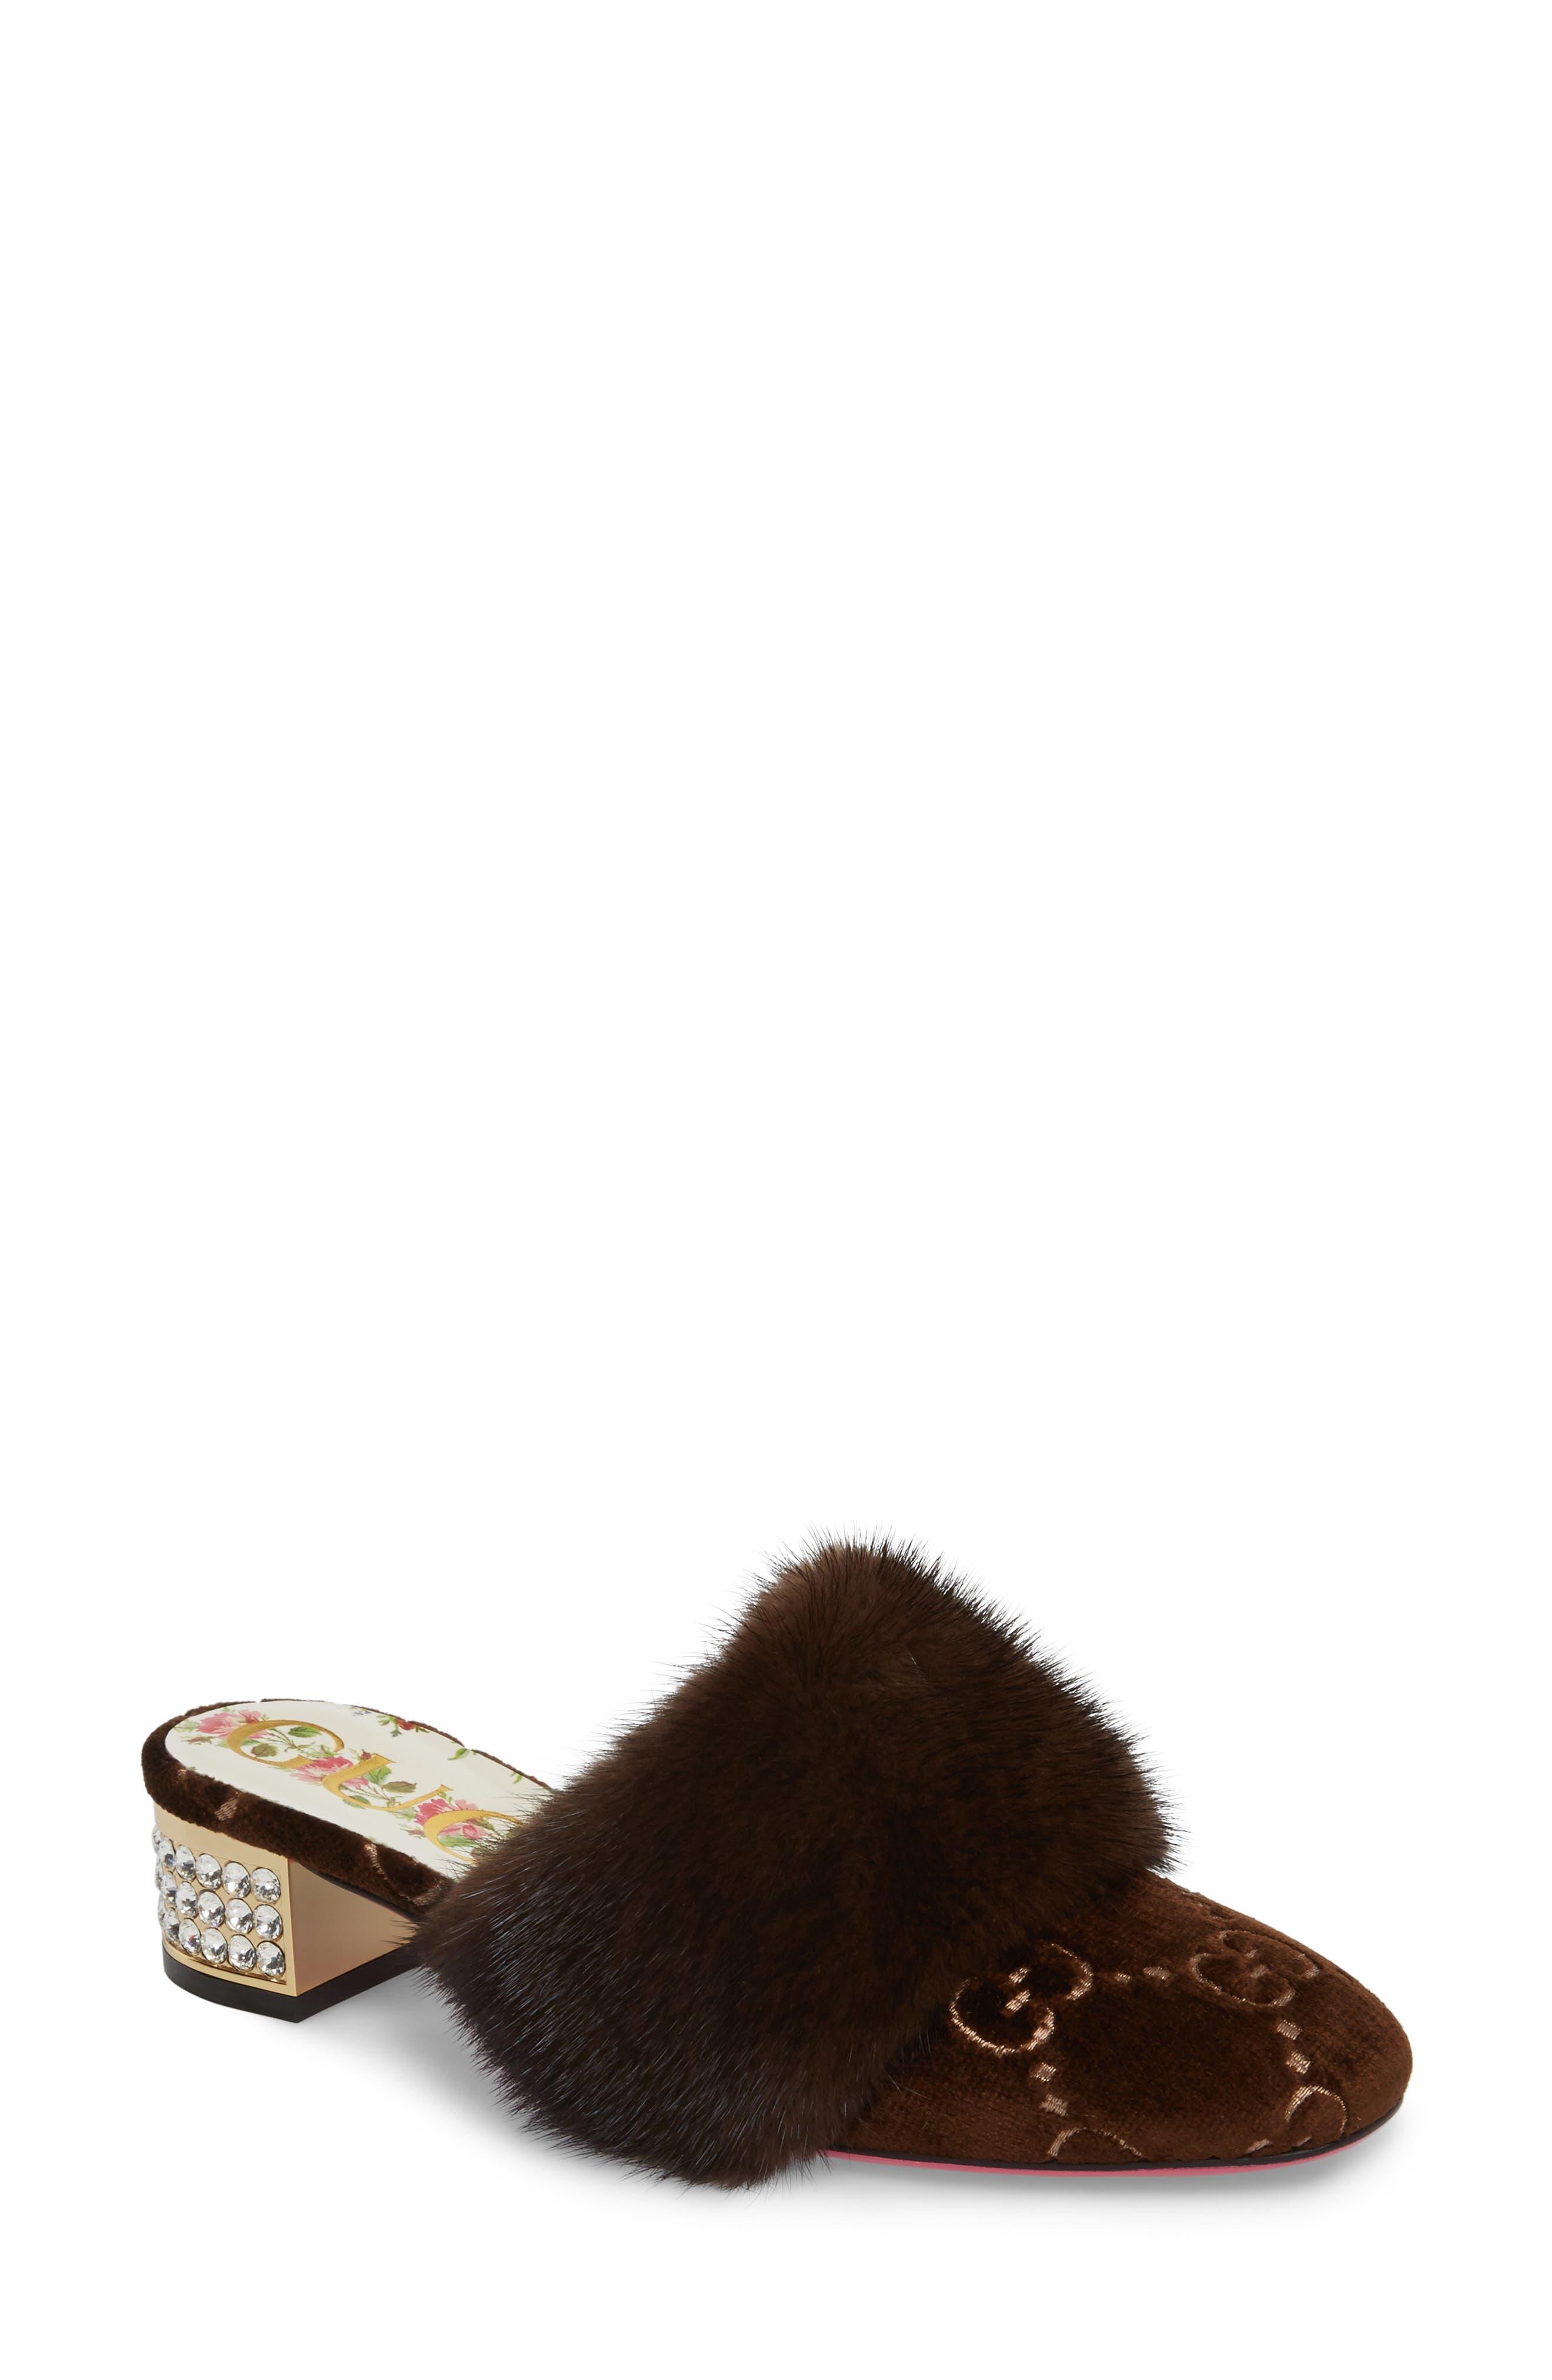 Candy Genuine Mink Fur Mule,                             Main thumbnail 1, color,                             MARRONE